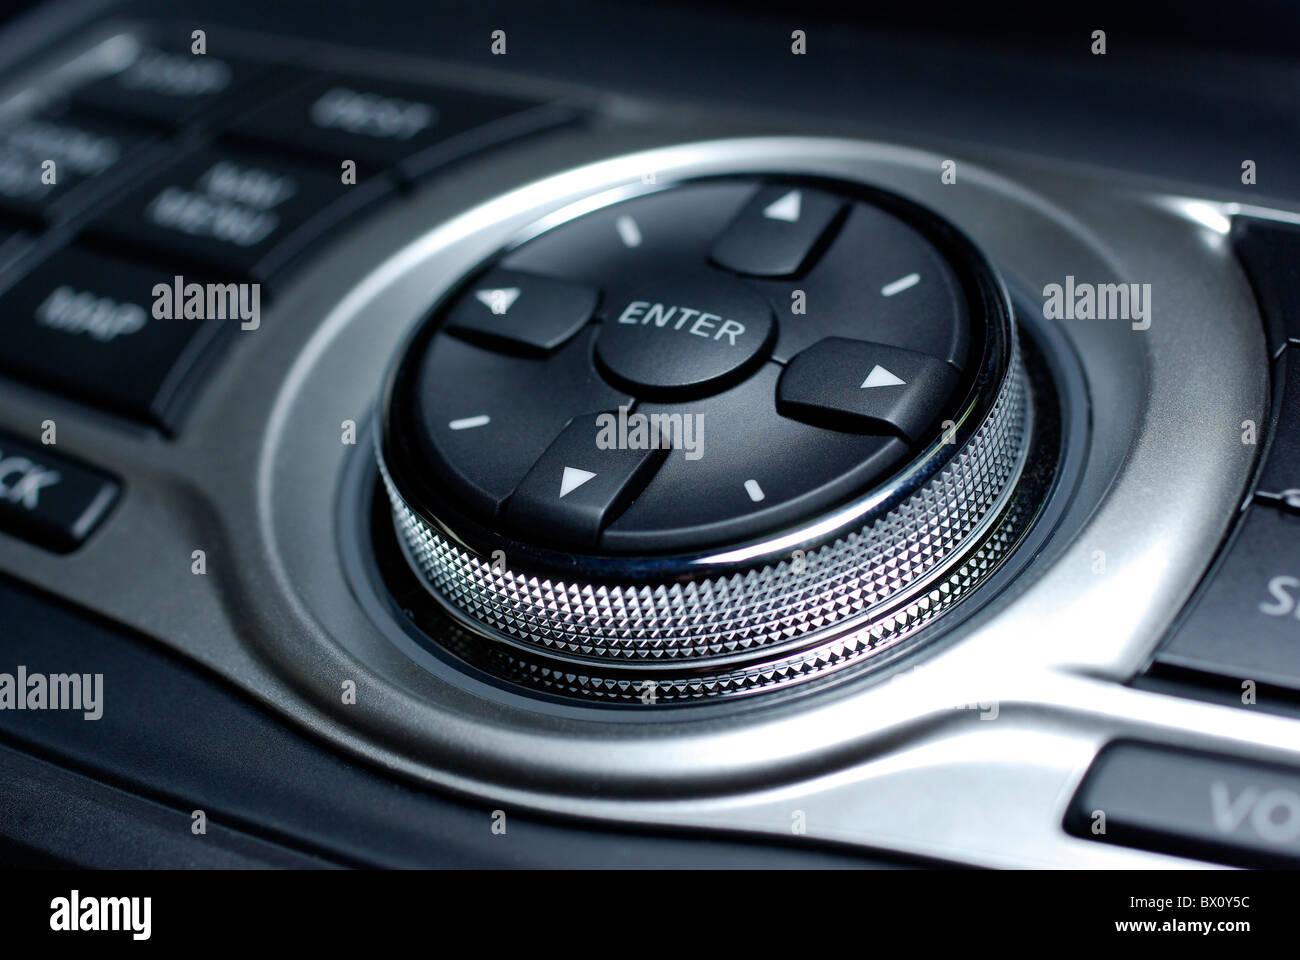 Modern control interface. Interior of luxury japanese car. - Stock Image